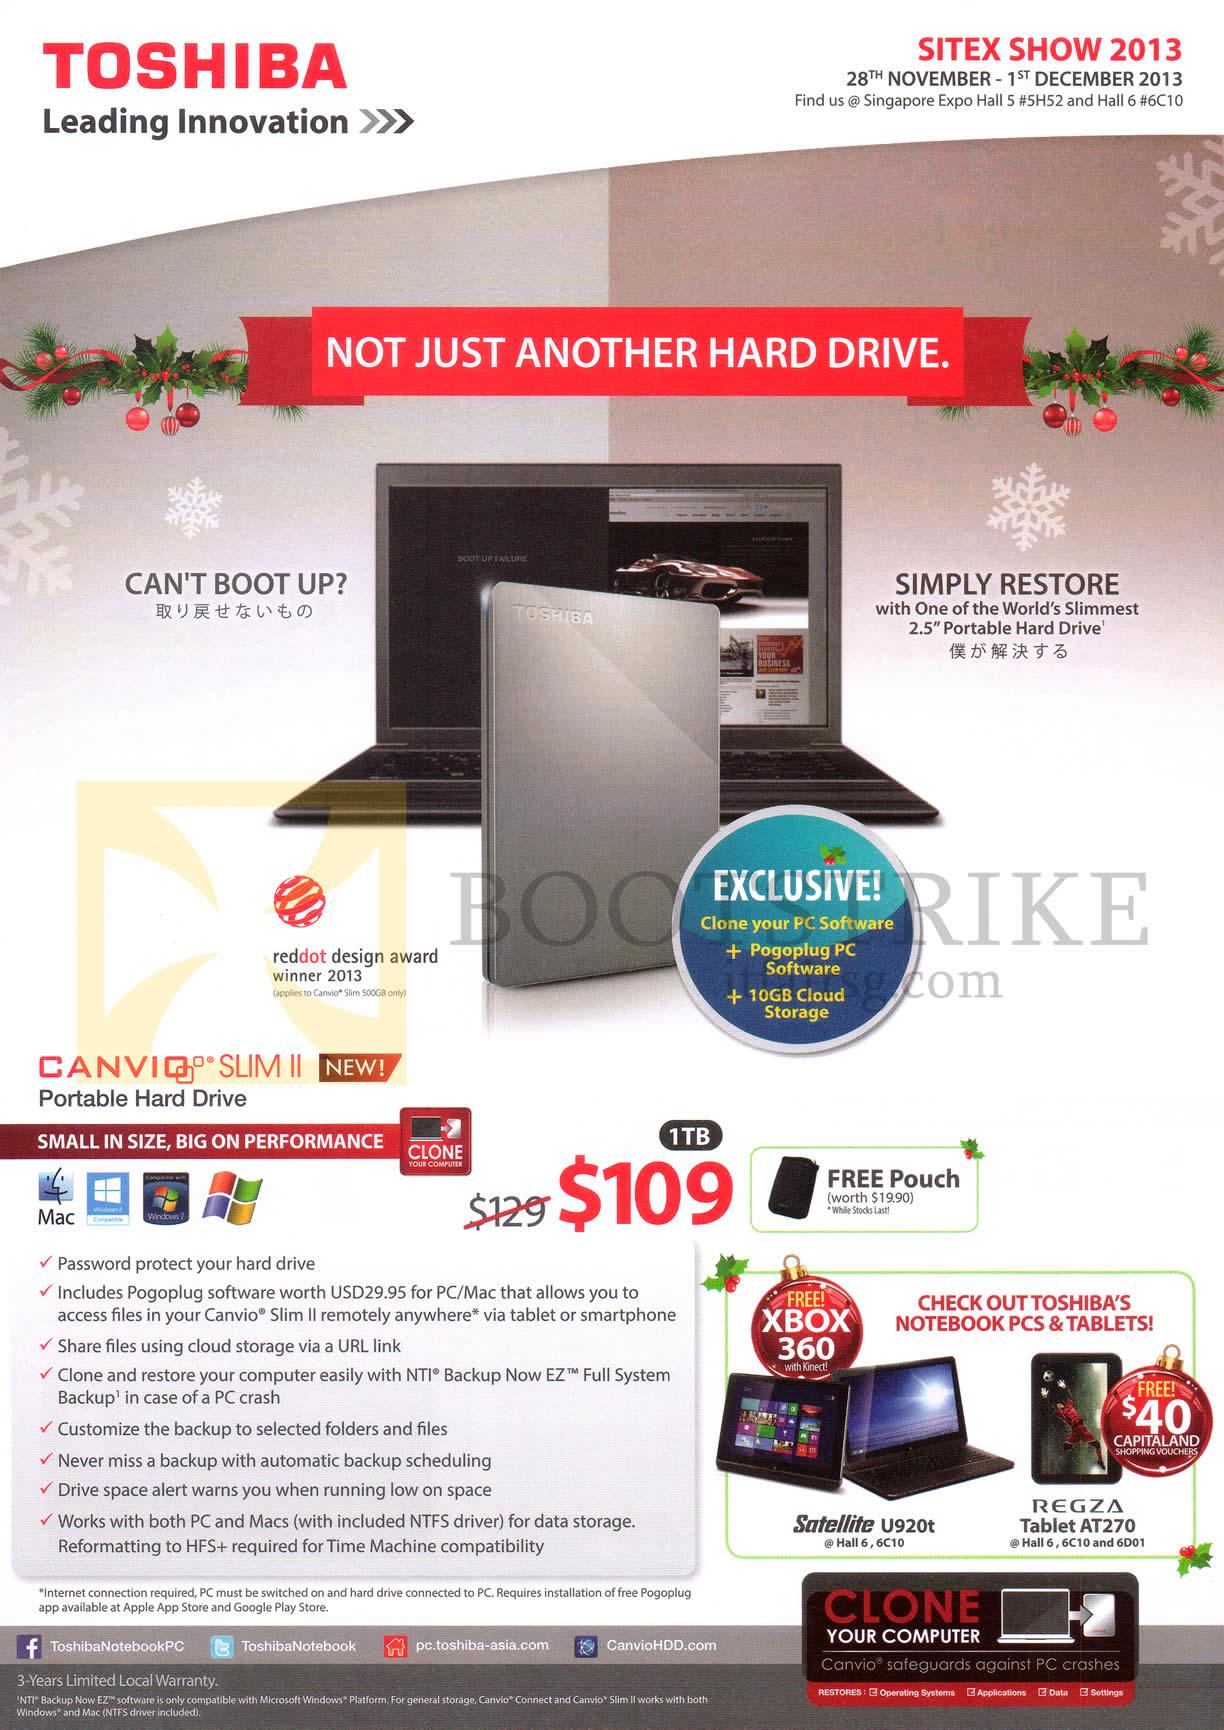 SITEX 2013 price list image brochure of Toshiba External Storage Canvio Slim II 1TB